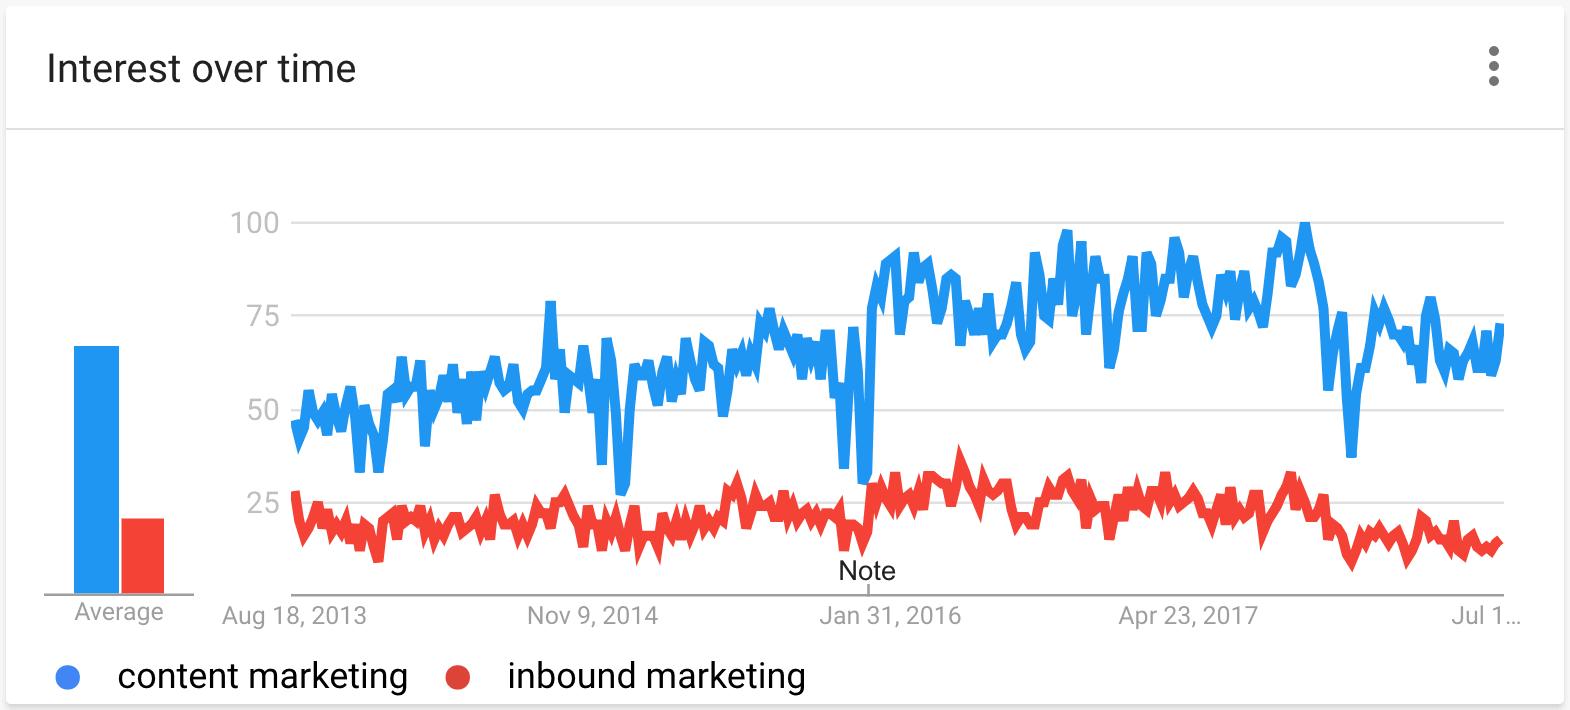 Google Trends – Interest over time – Comparison